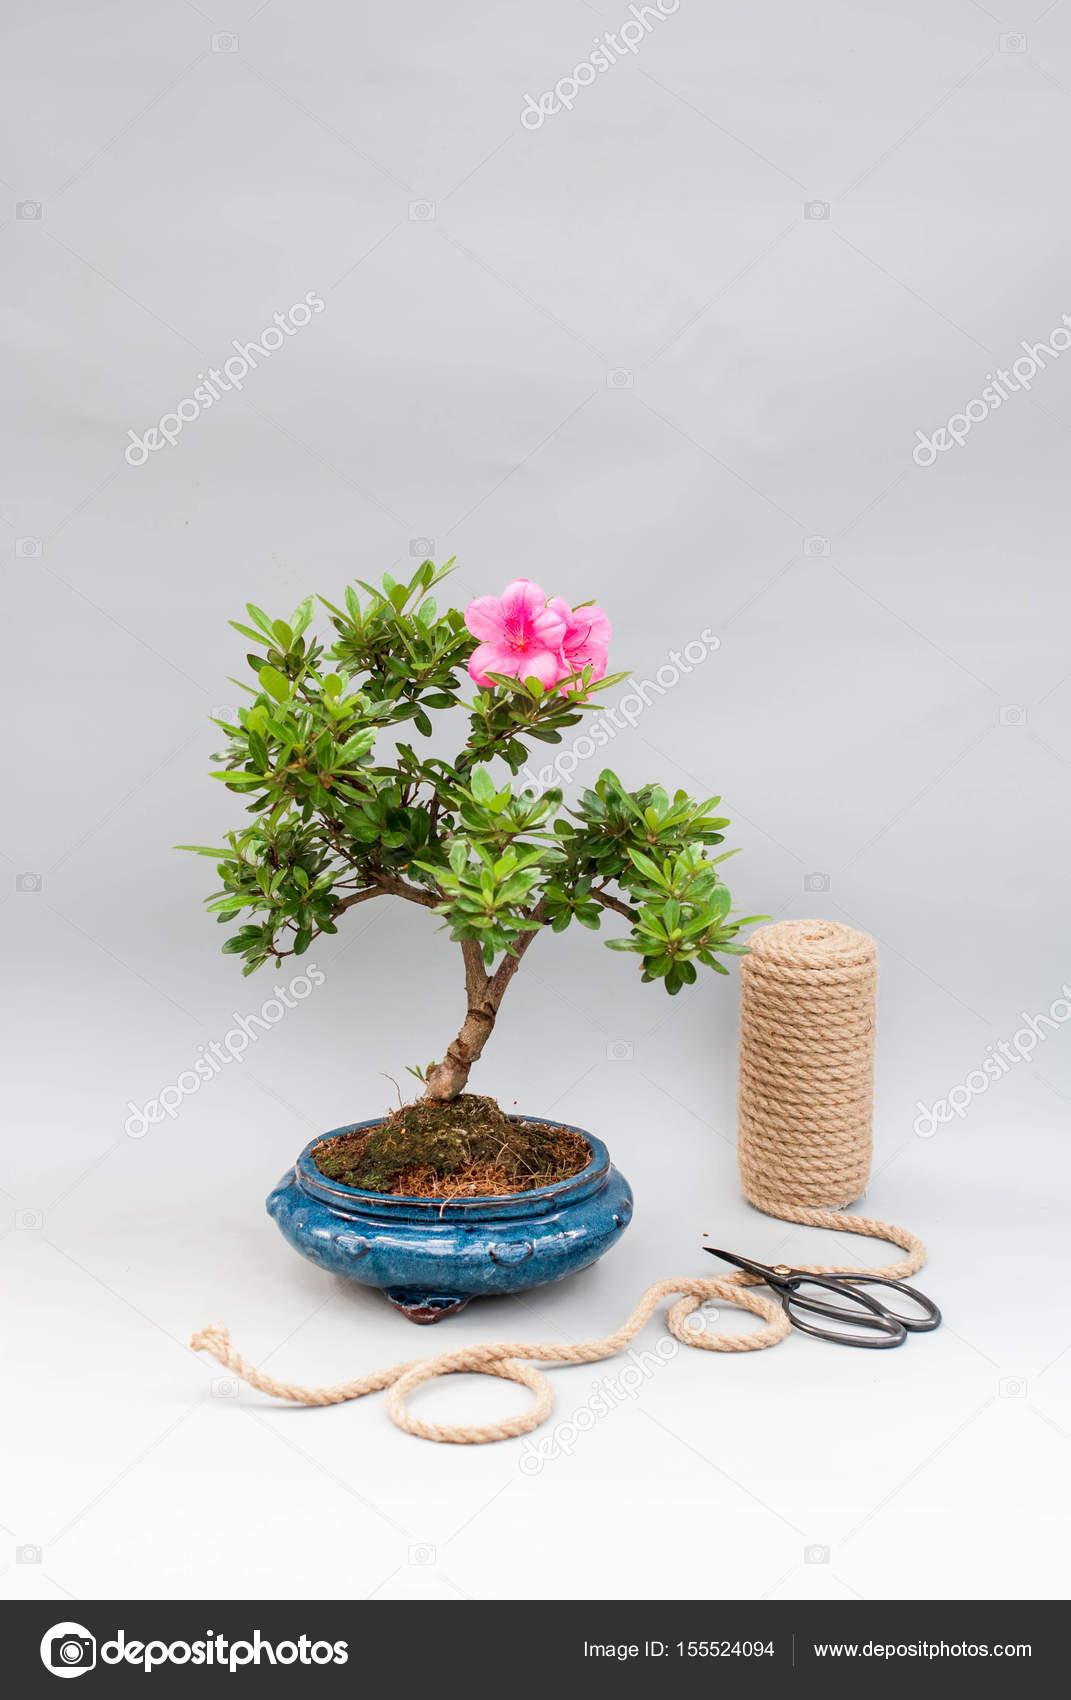 https://st3.depositphotos.com/3830791/15552/i/1600/depositphotos_155524094-stock-photo-blooming-bonsai-azalea-on-a.jpg